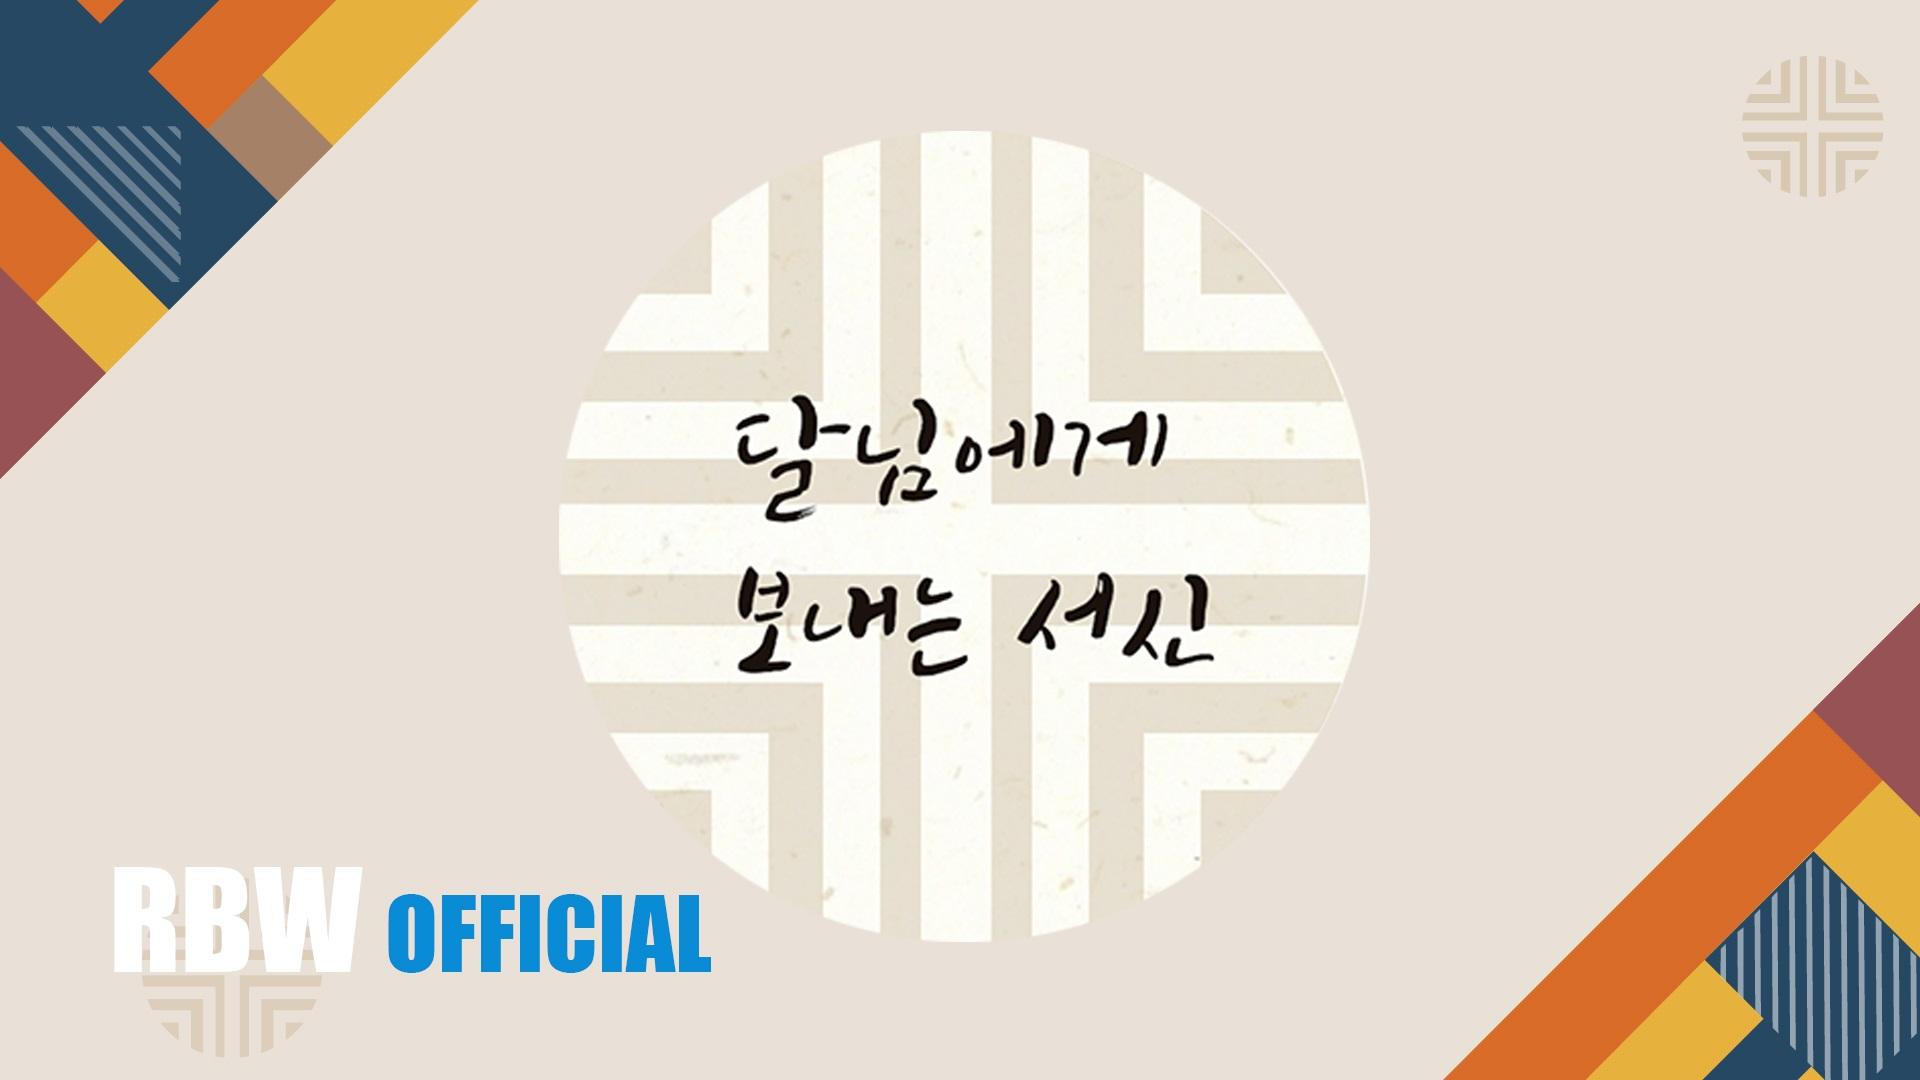 [Special] ONEUS(원어스)가 전하는 2019 추석 인사 메시지